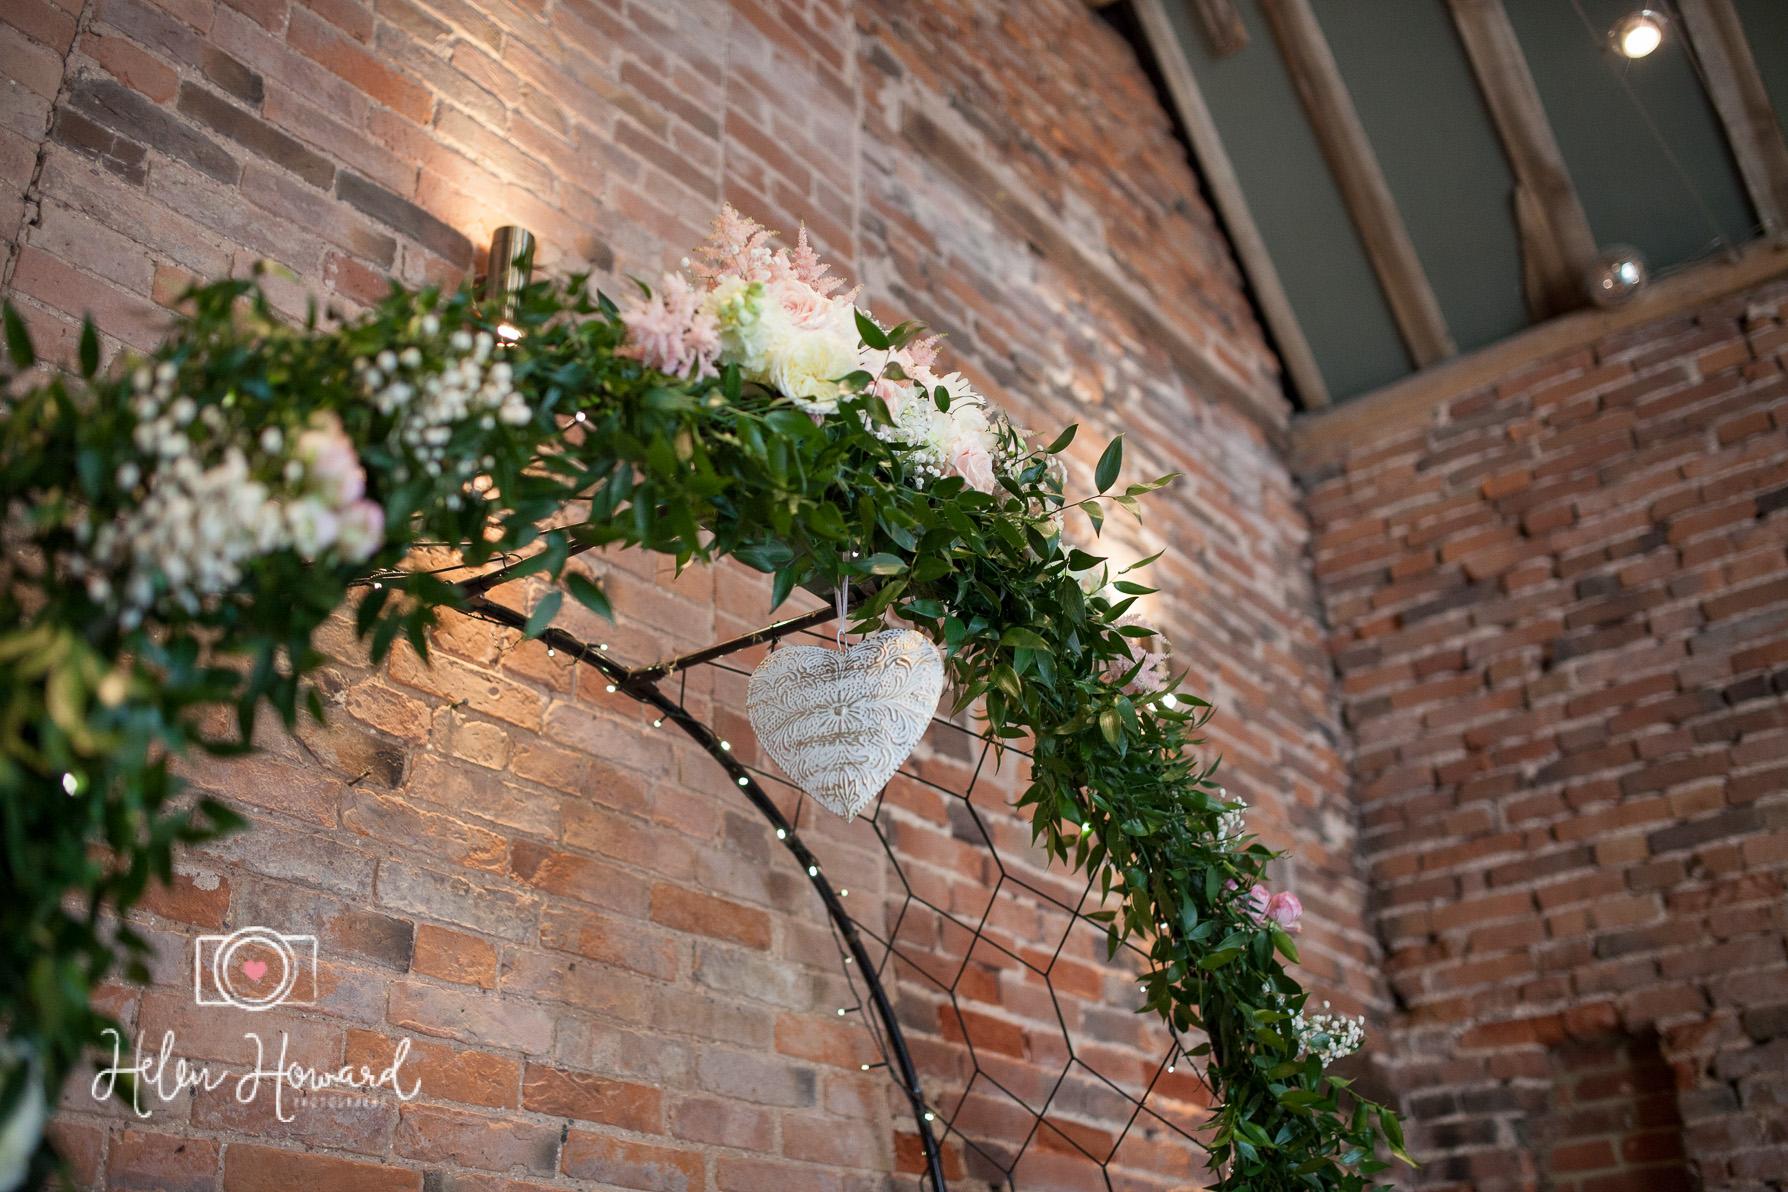 Helen Howard Photography Packington Moor Wedding-19.jpg